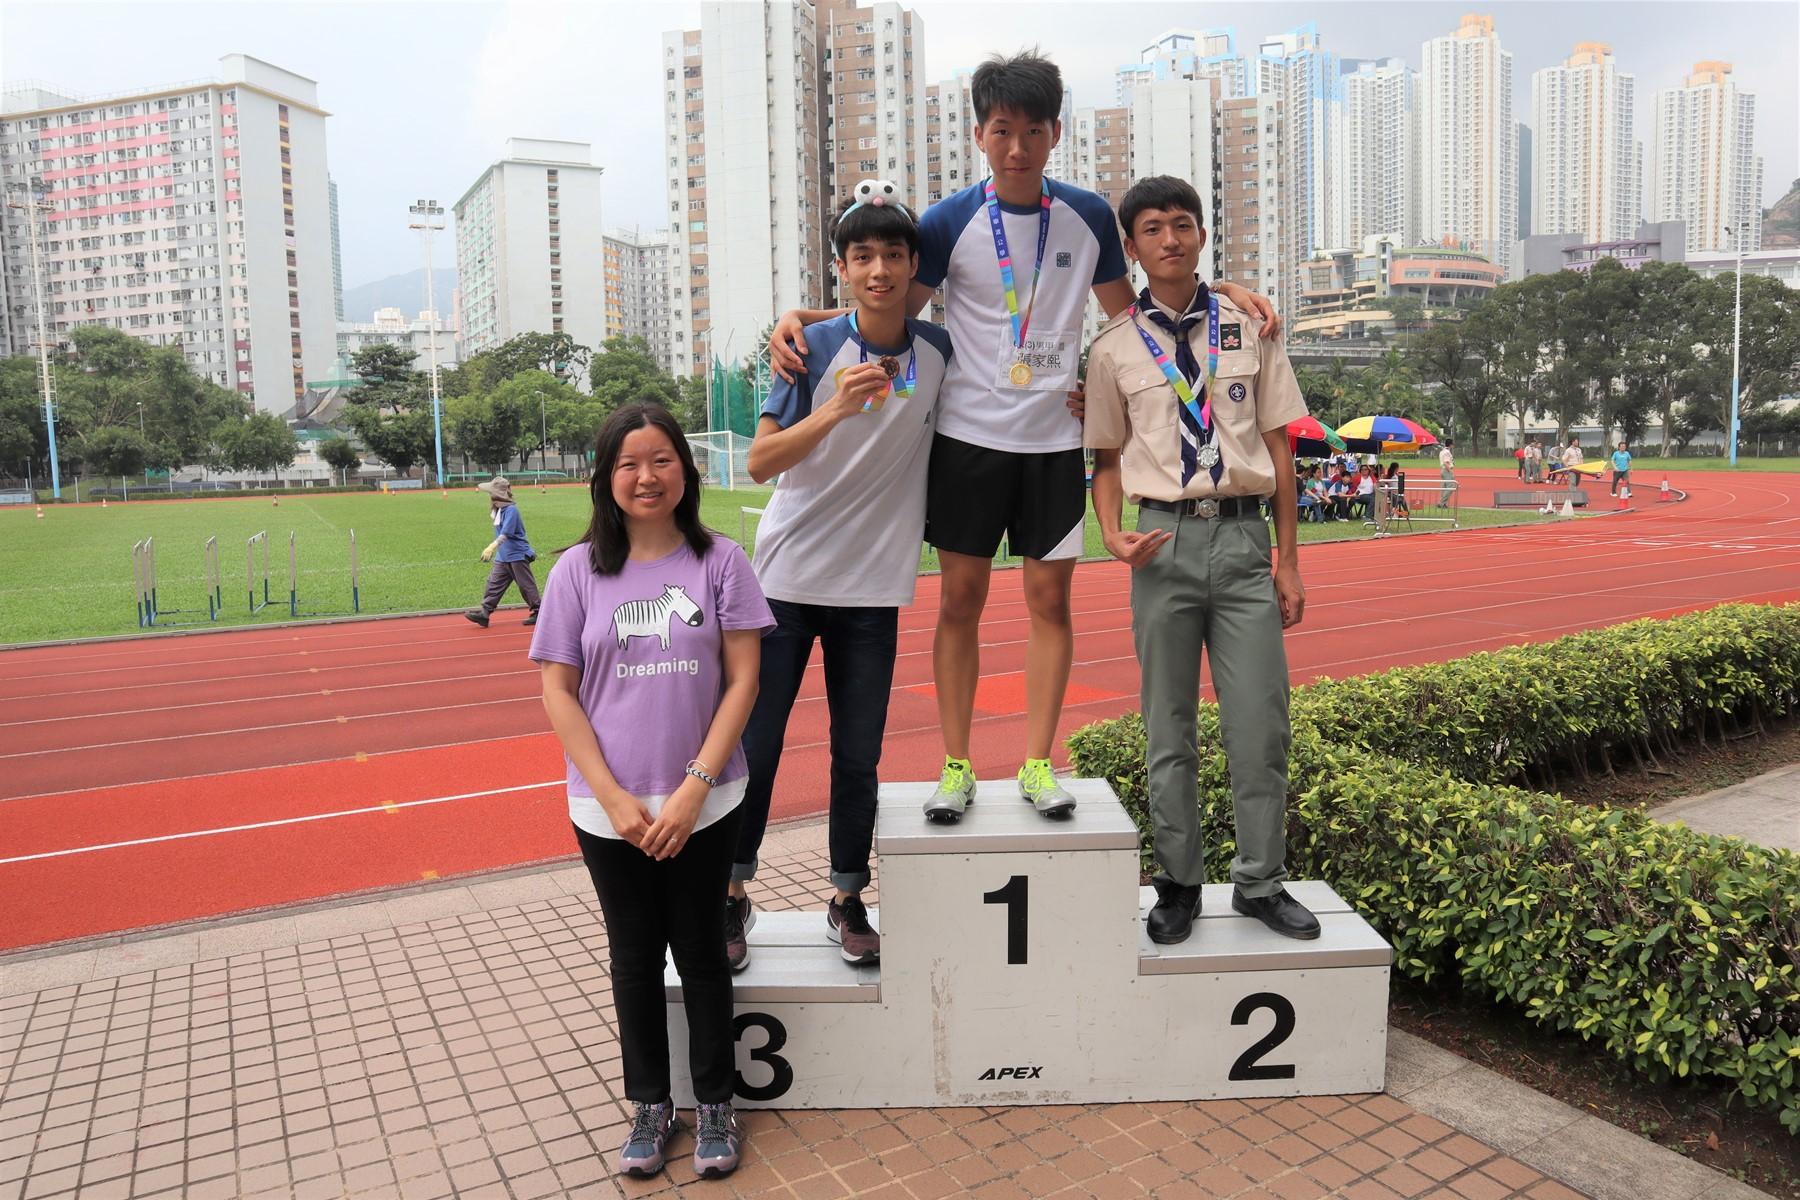 https://www.npc.edu.hk/sites/default/files/img_9334_1.jpg